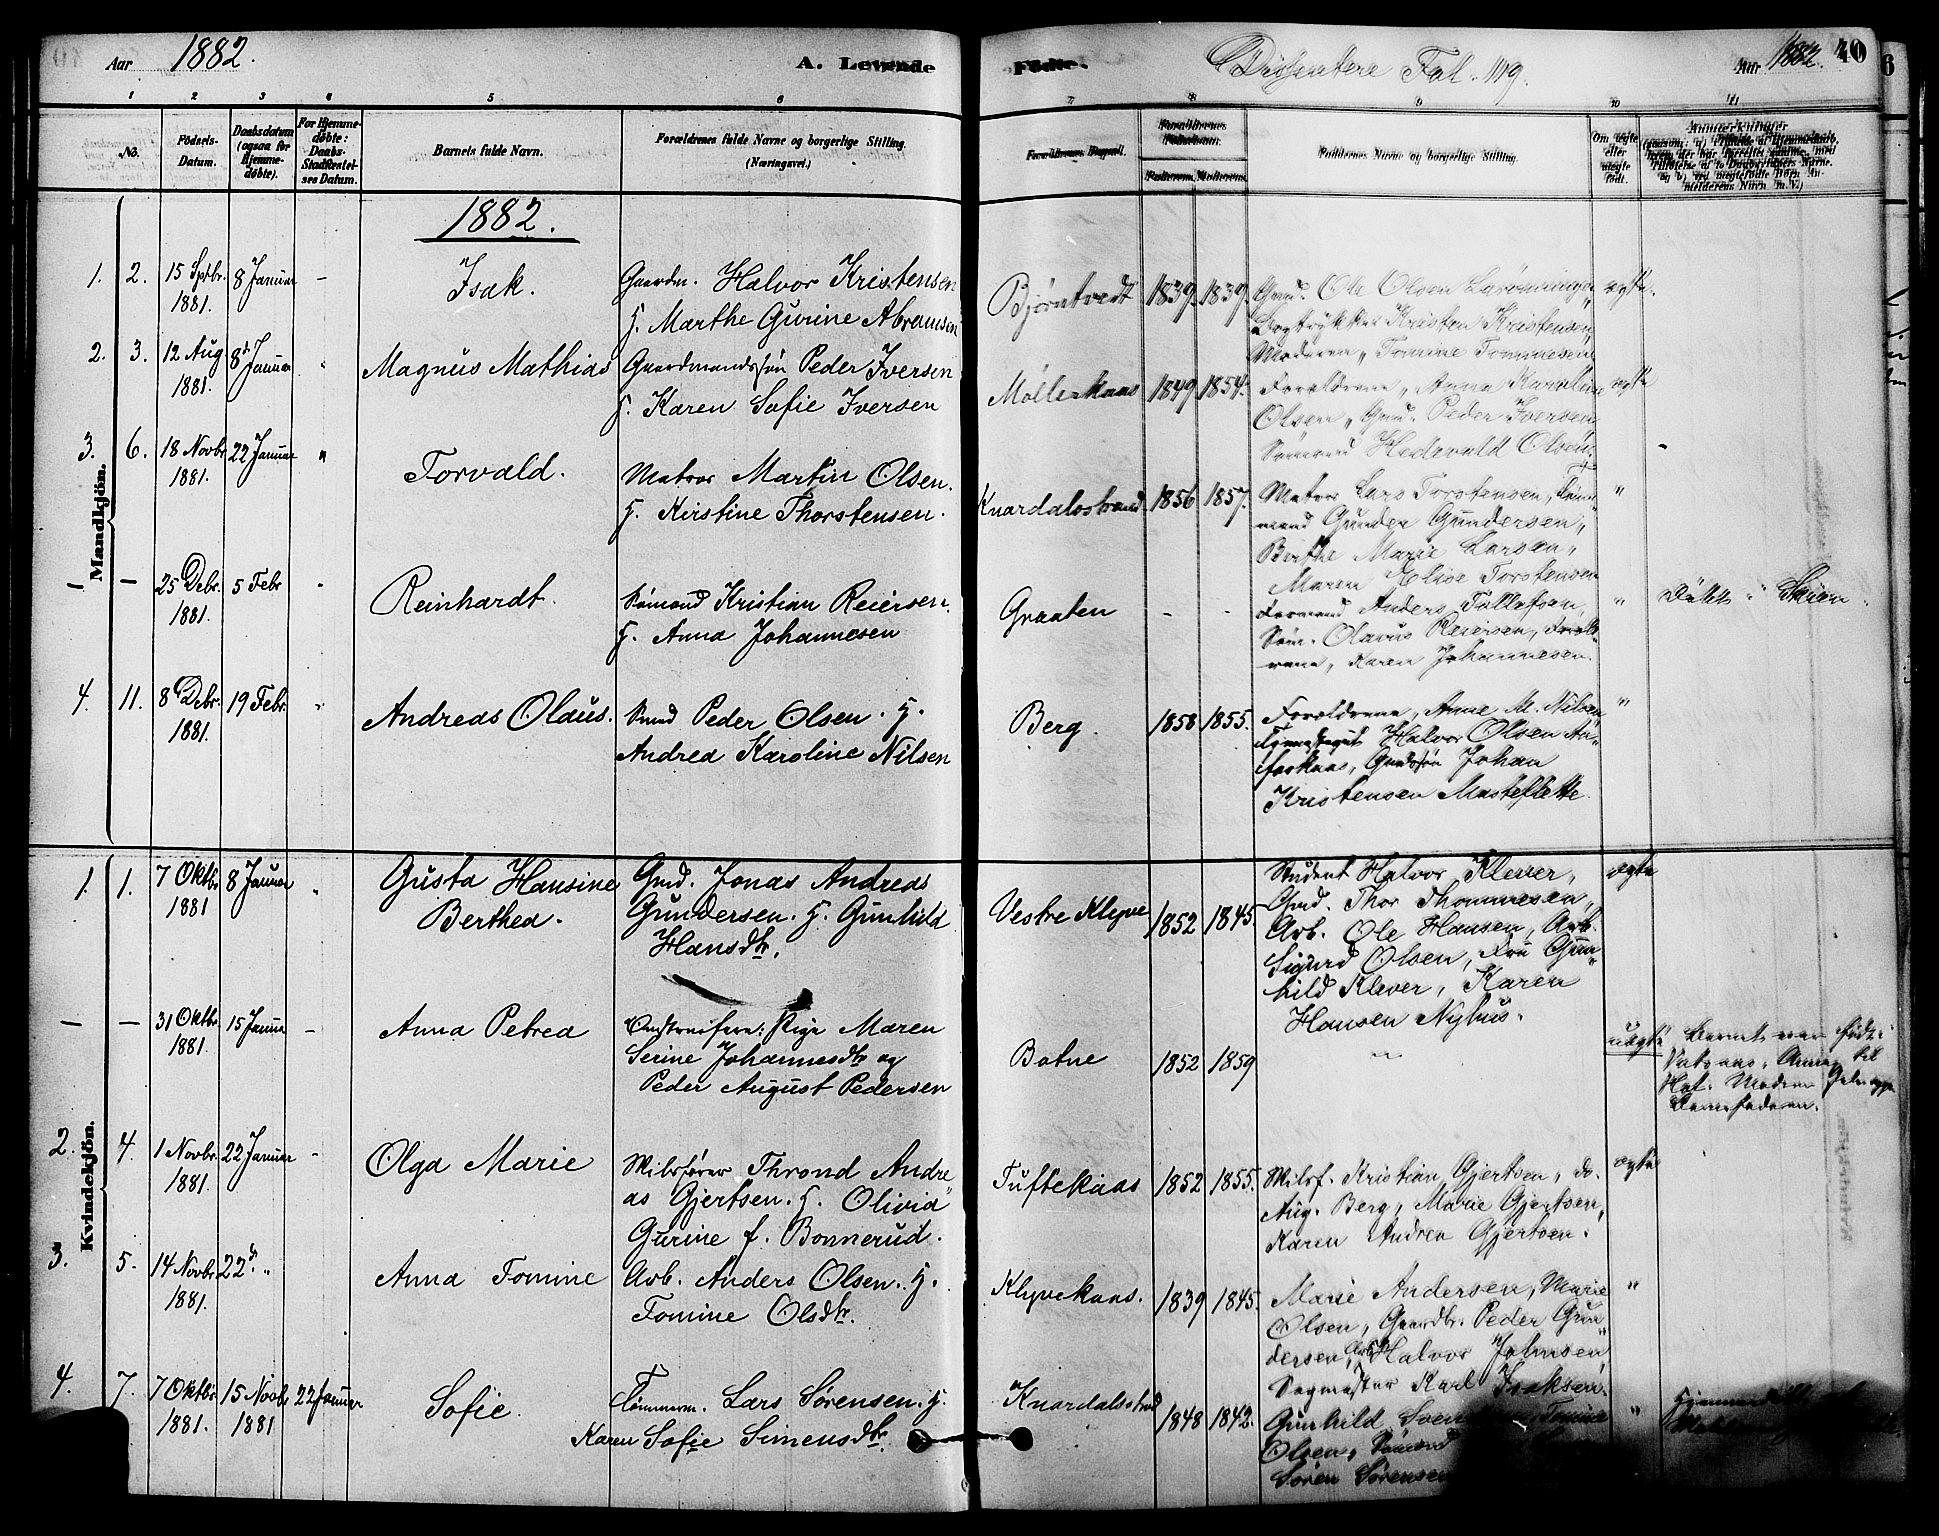 SAKO, Solum kirkebøker, F/Fa/L0009: Ministerialbok nr. I 9, 1877-1887, s. 40